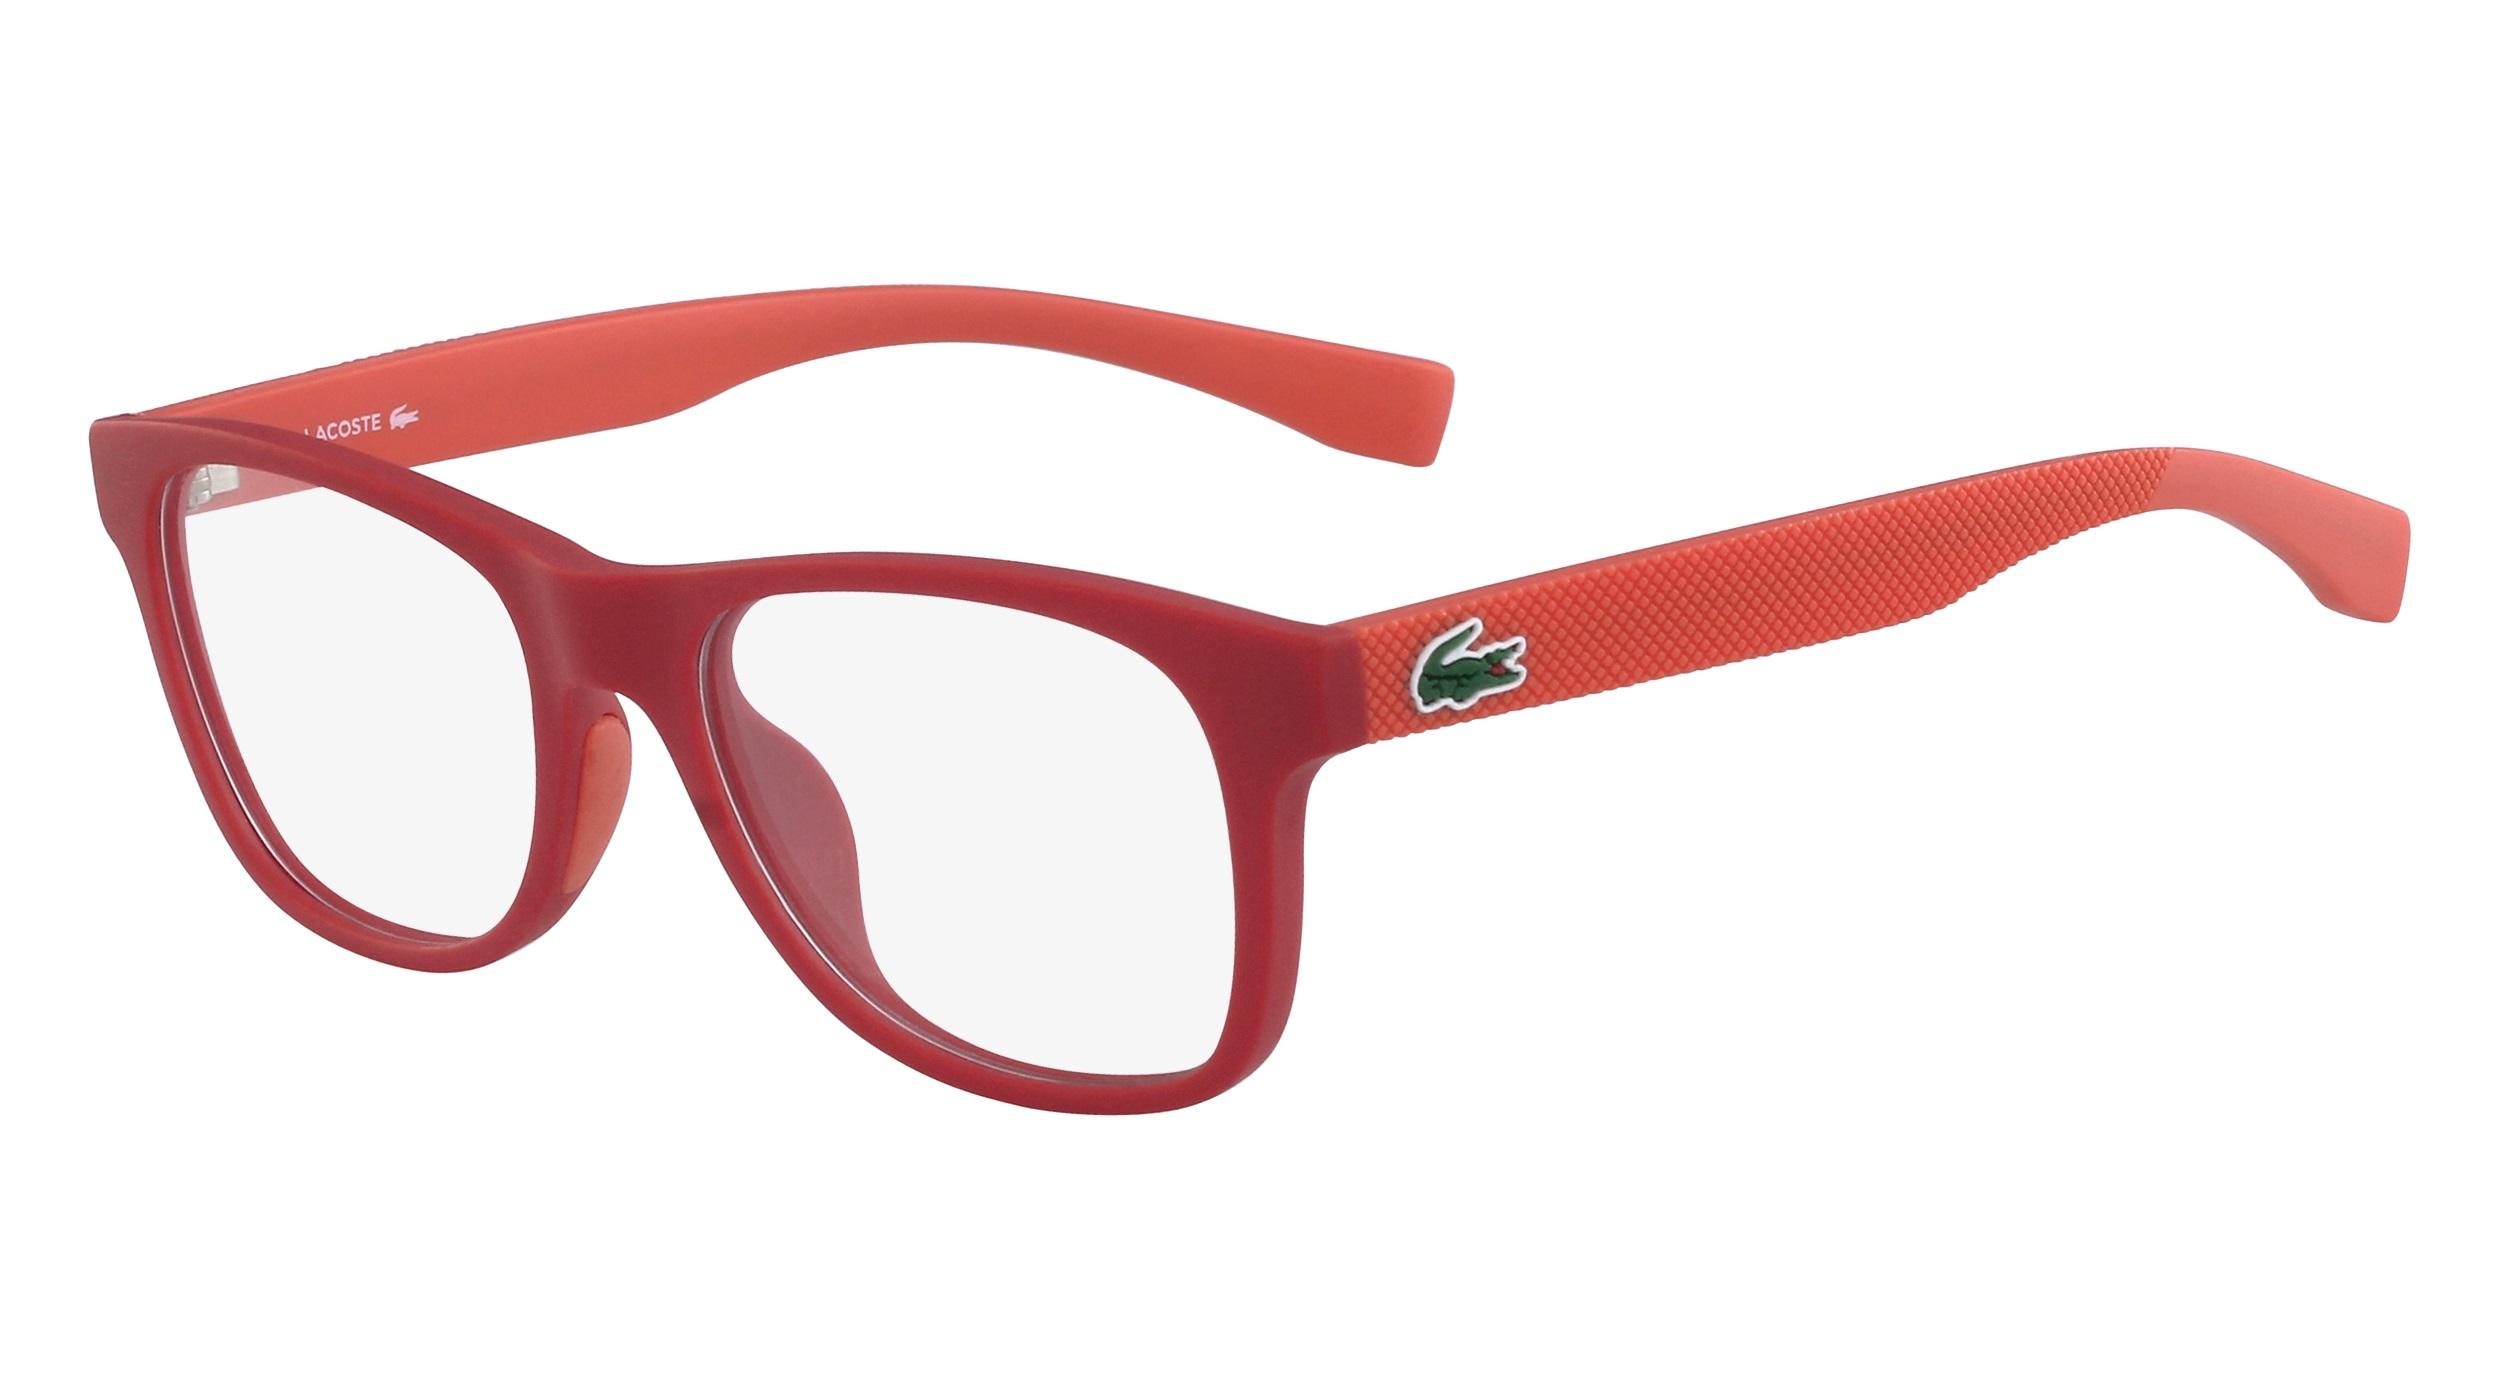 501b4c9590014 Eyewear for Kids - Boy - Optiwow